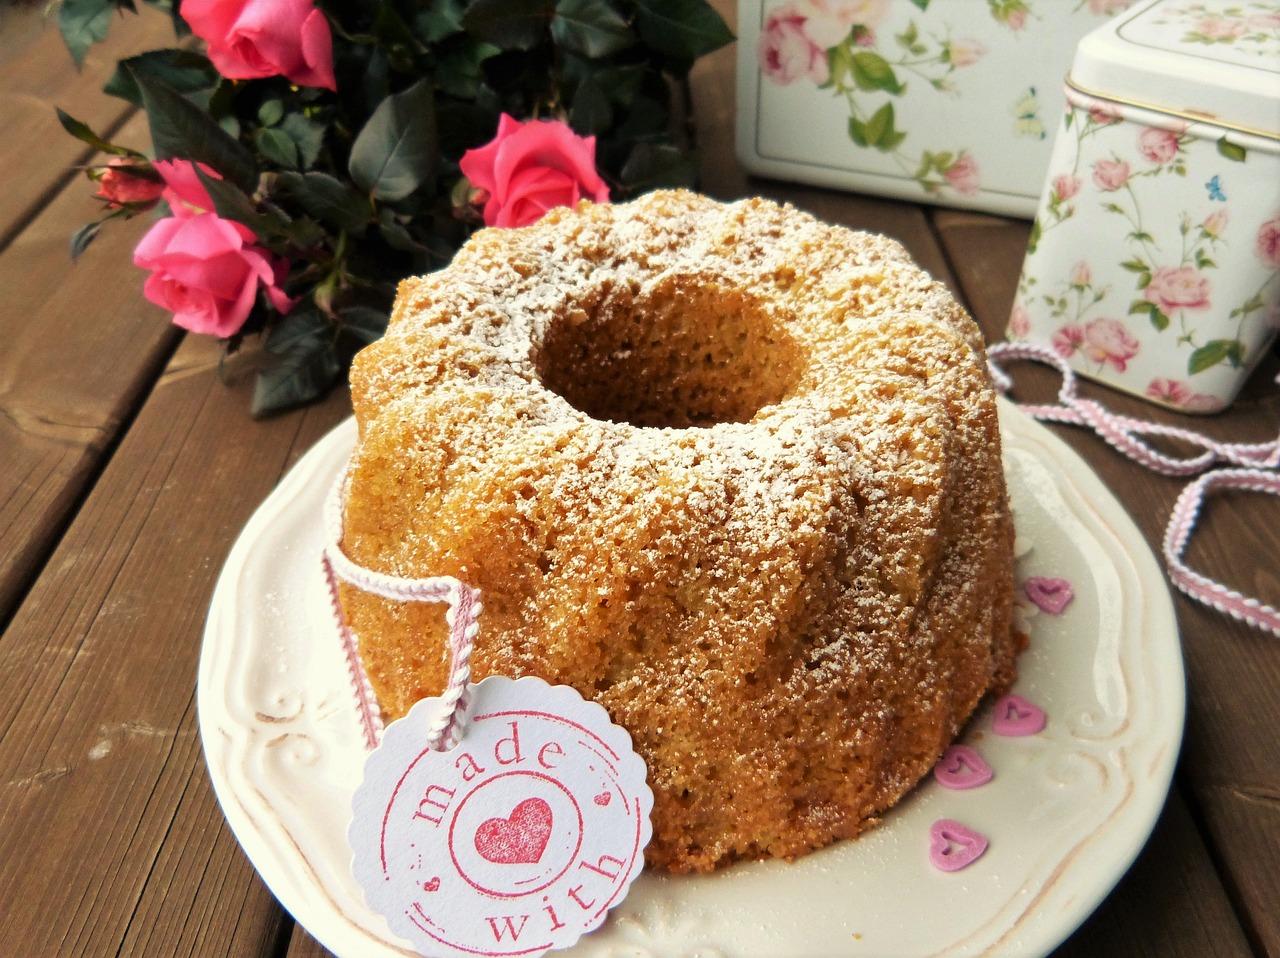 cake-2048732_1280